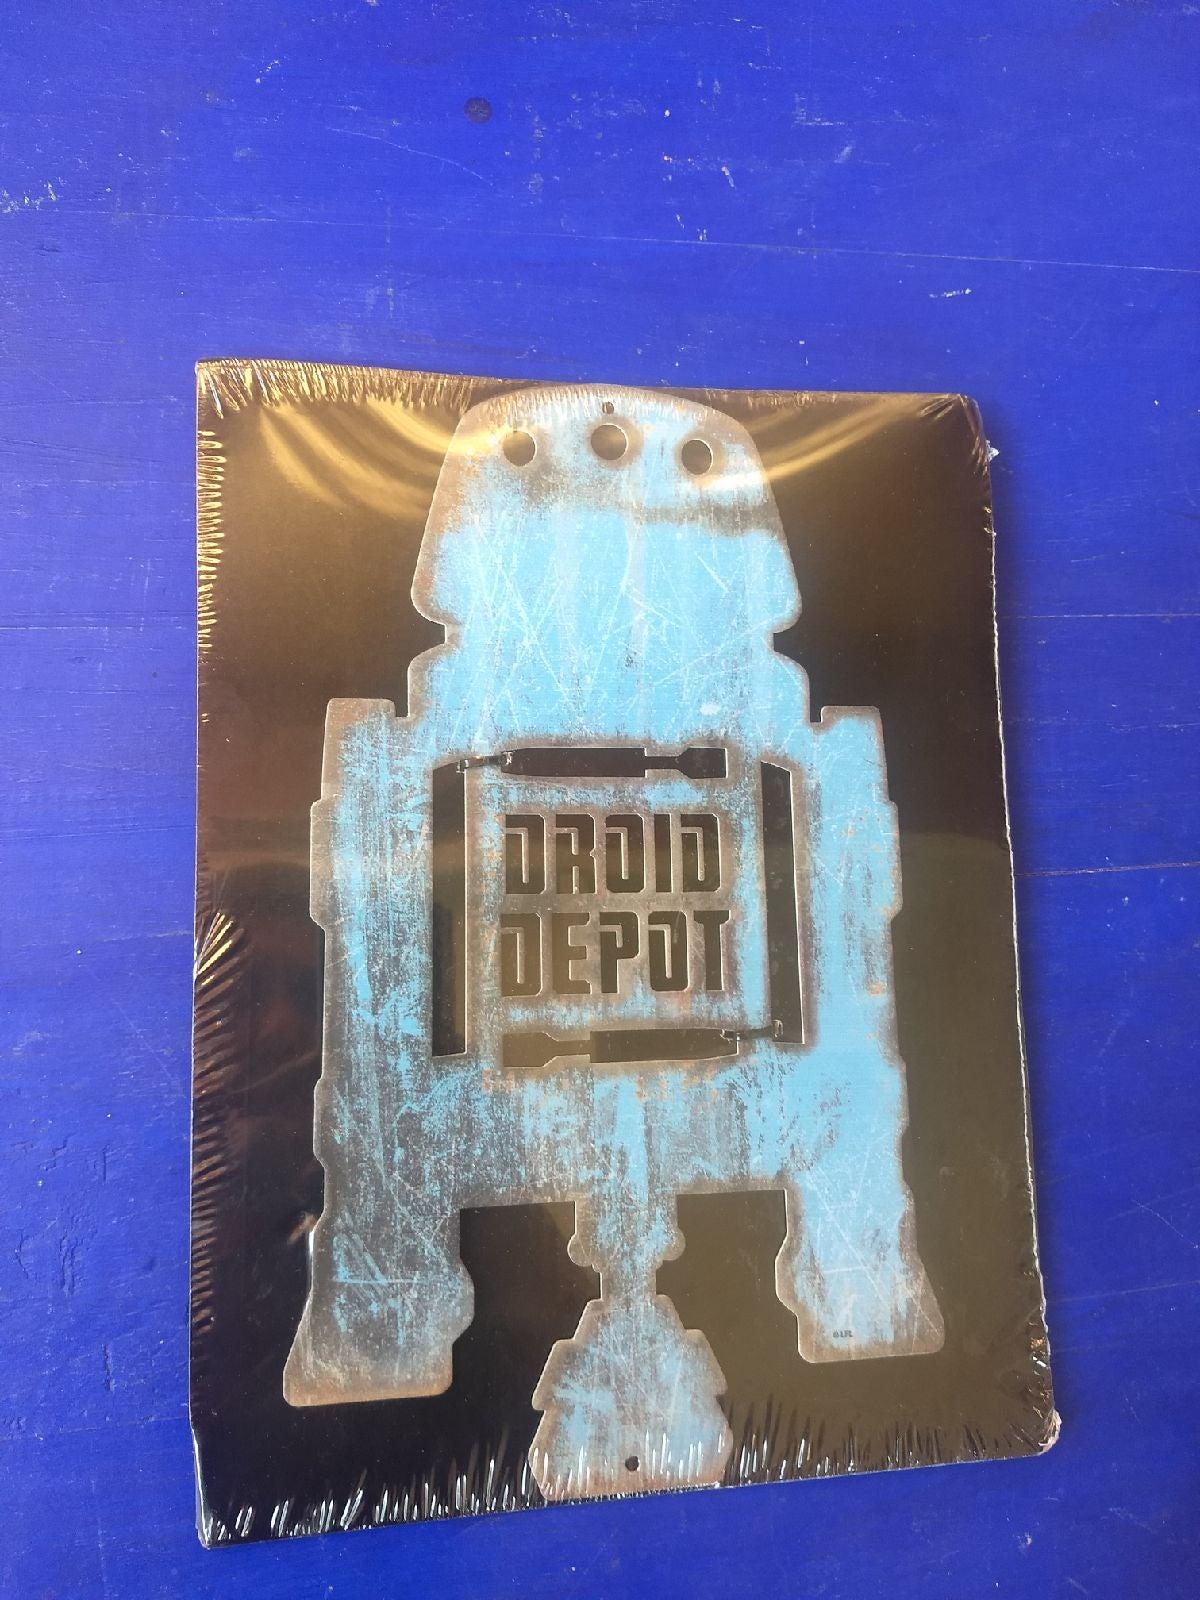 Star wars Droid depot sign New